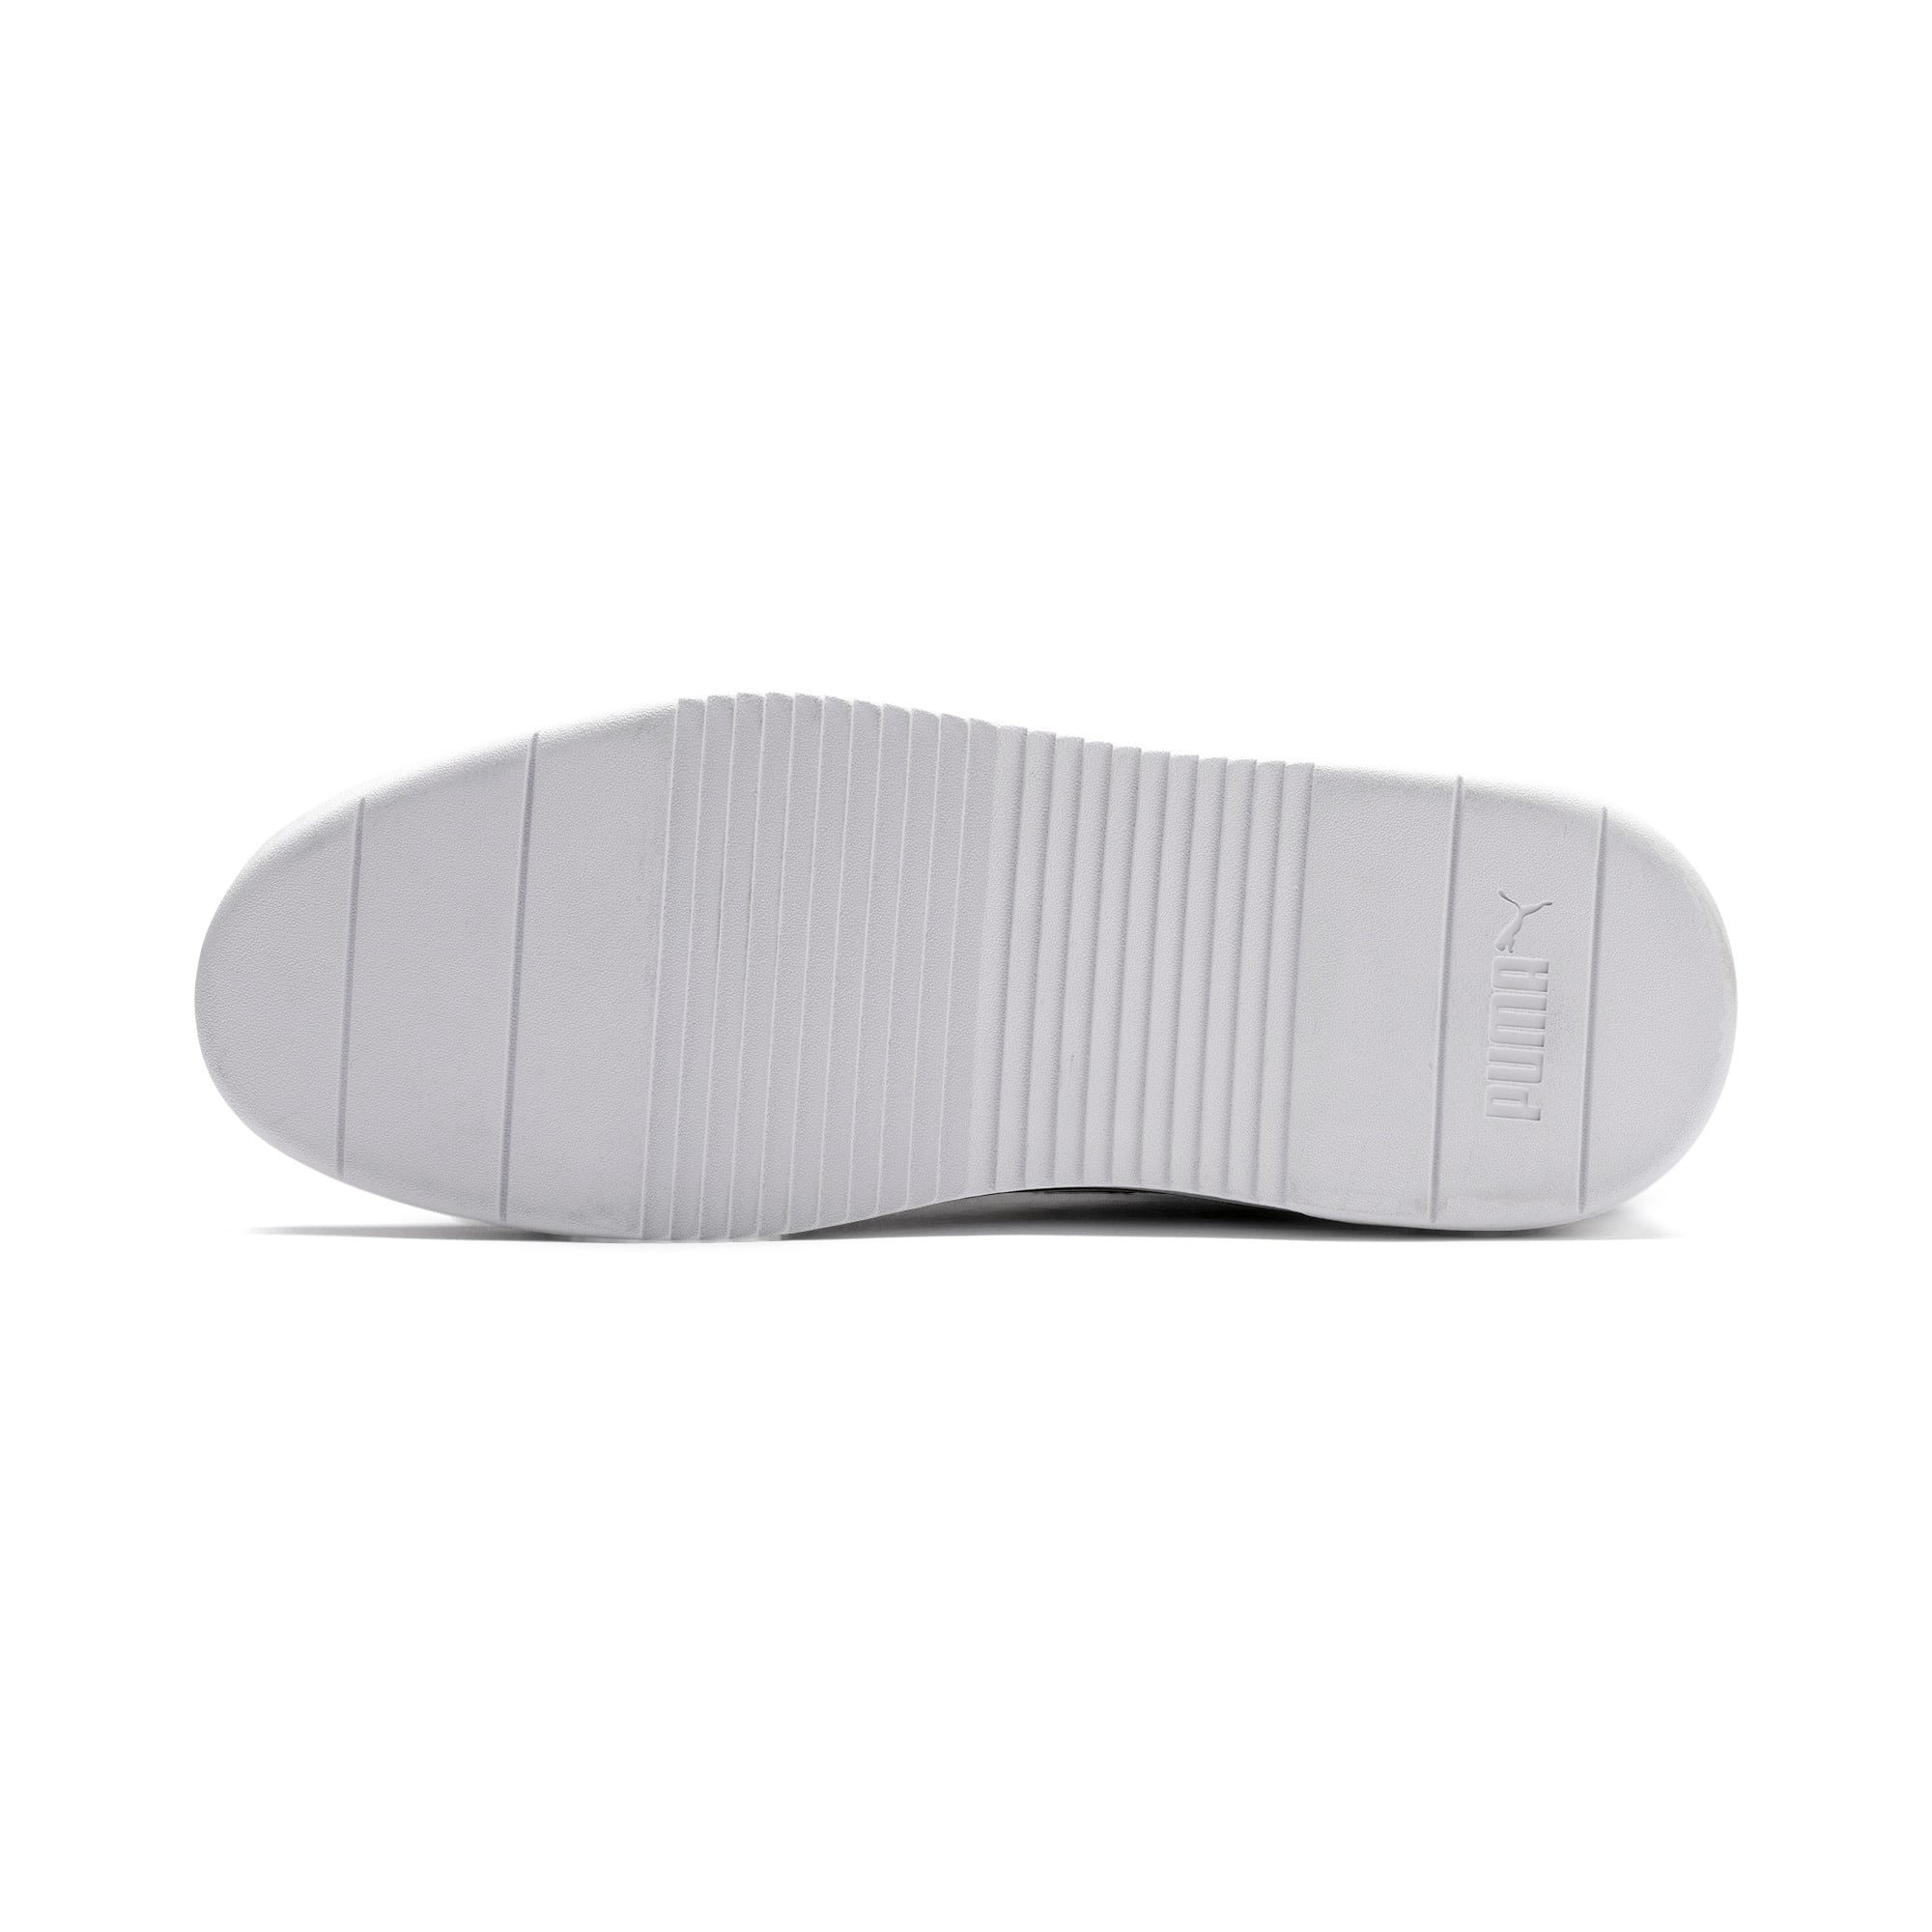 Thumbnail 5 of Cali-0 Sneakers, Puma Black-Puma Blk-Puma Wht, medium